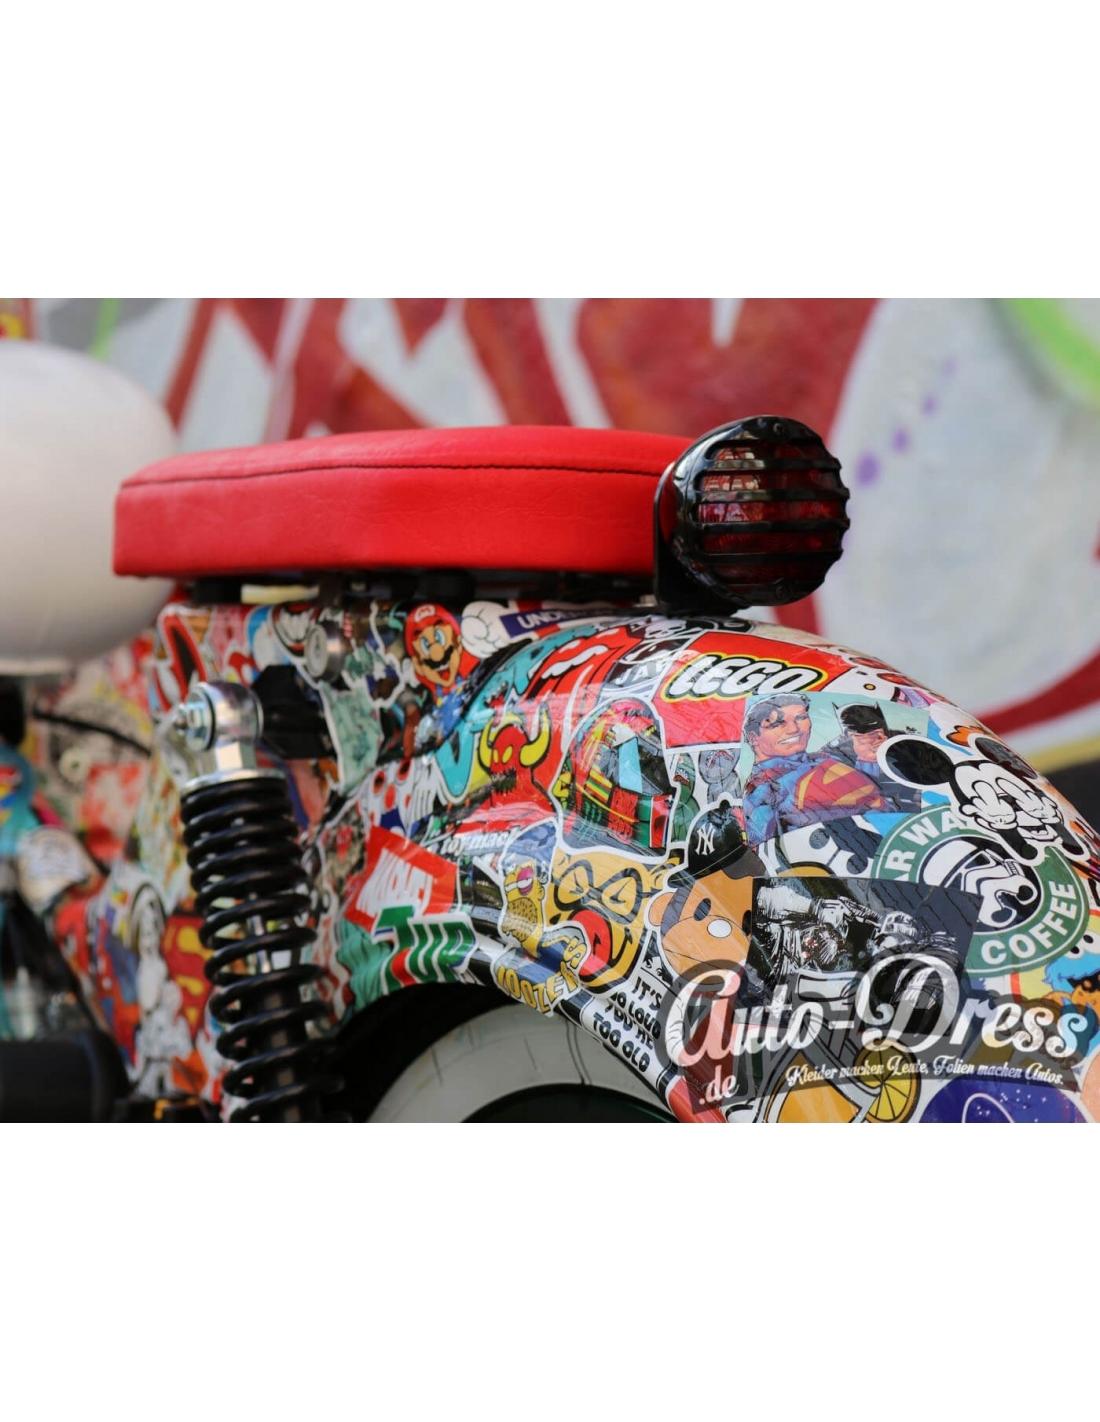 100 Aufkleber Sticker Retro Graffiti Style Echte